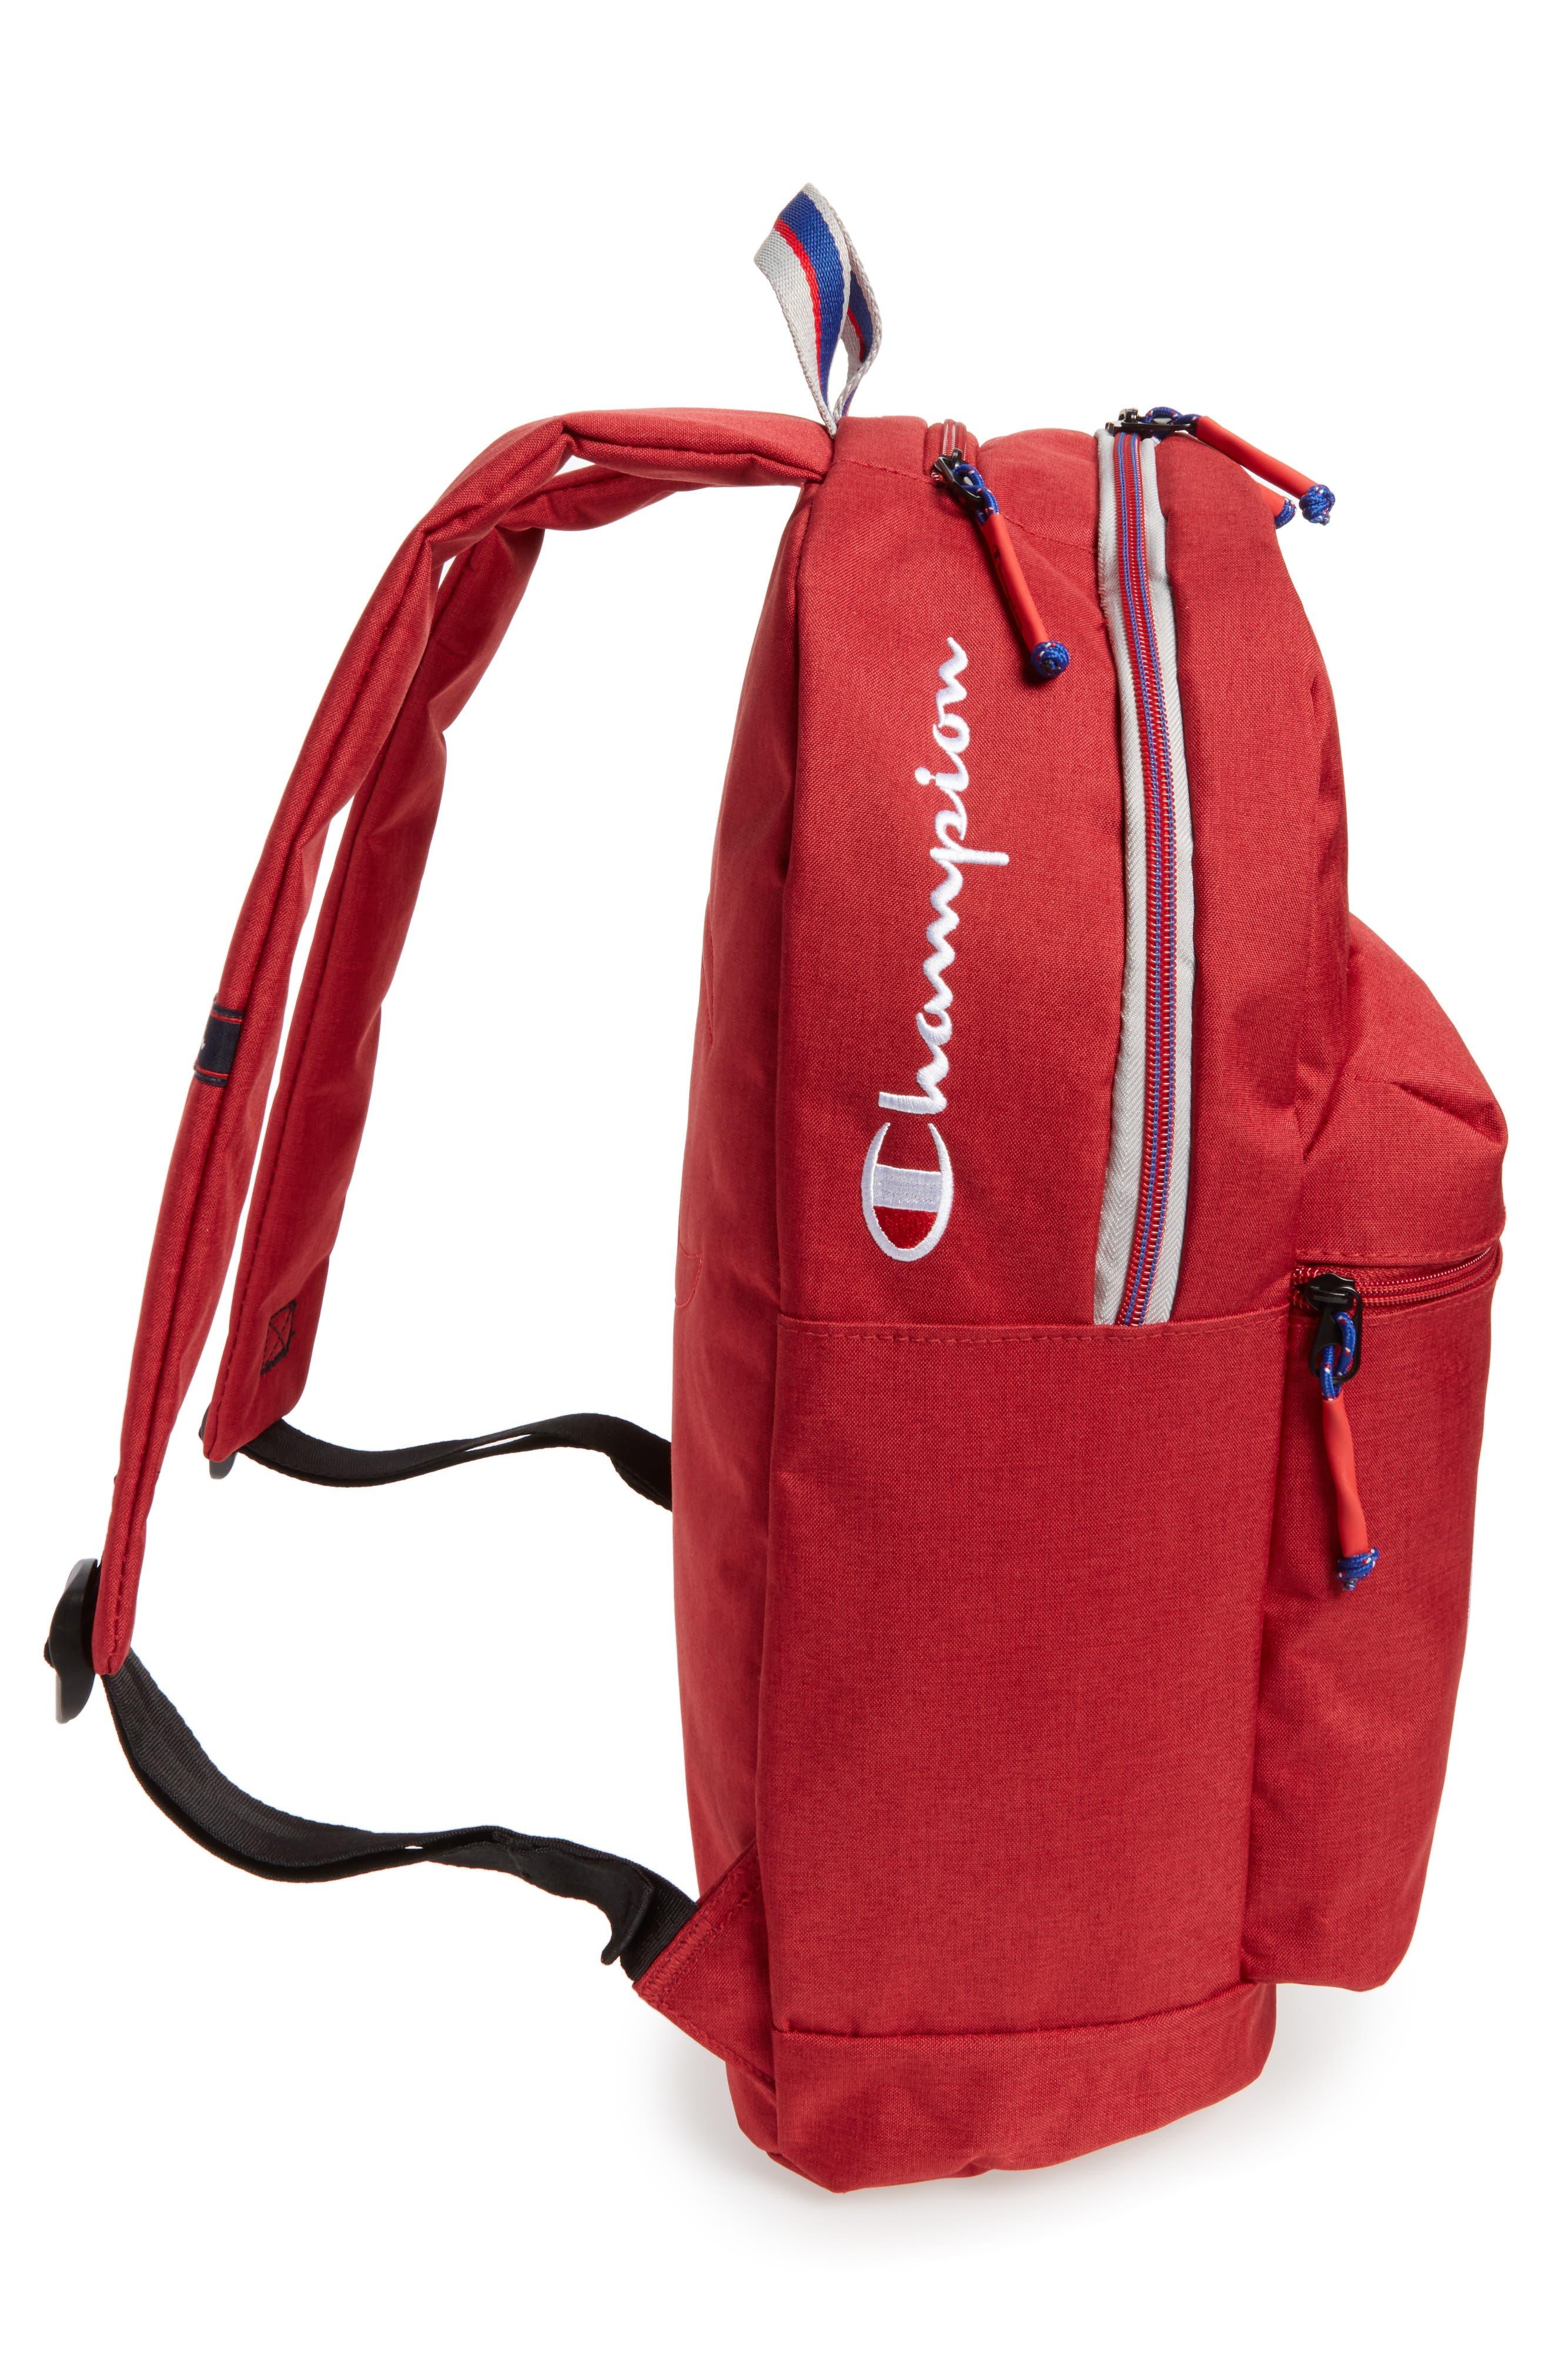 Supercize Backpack,                             Alternate thumbnail 5, color,                             SCARLET HEATHER